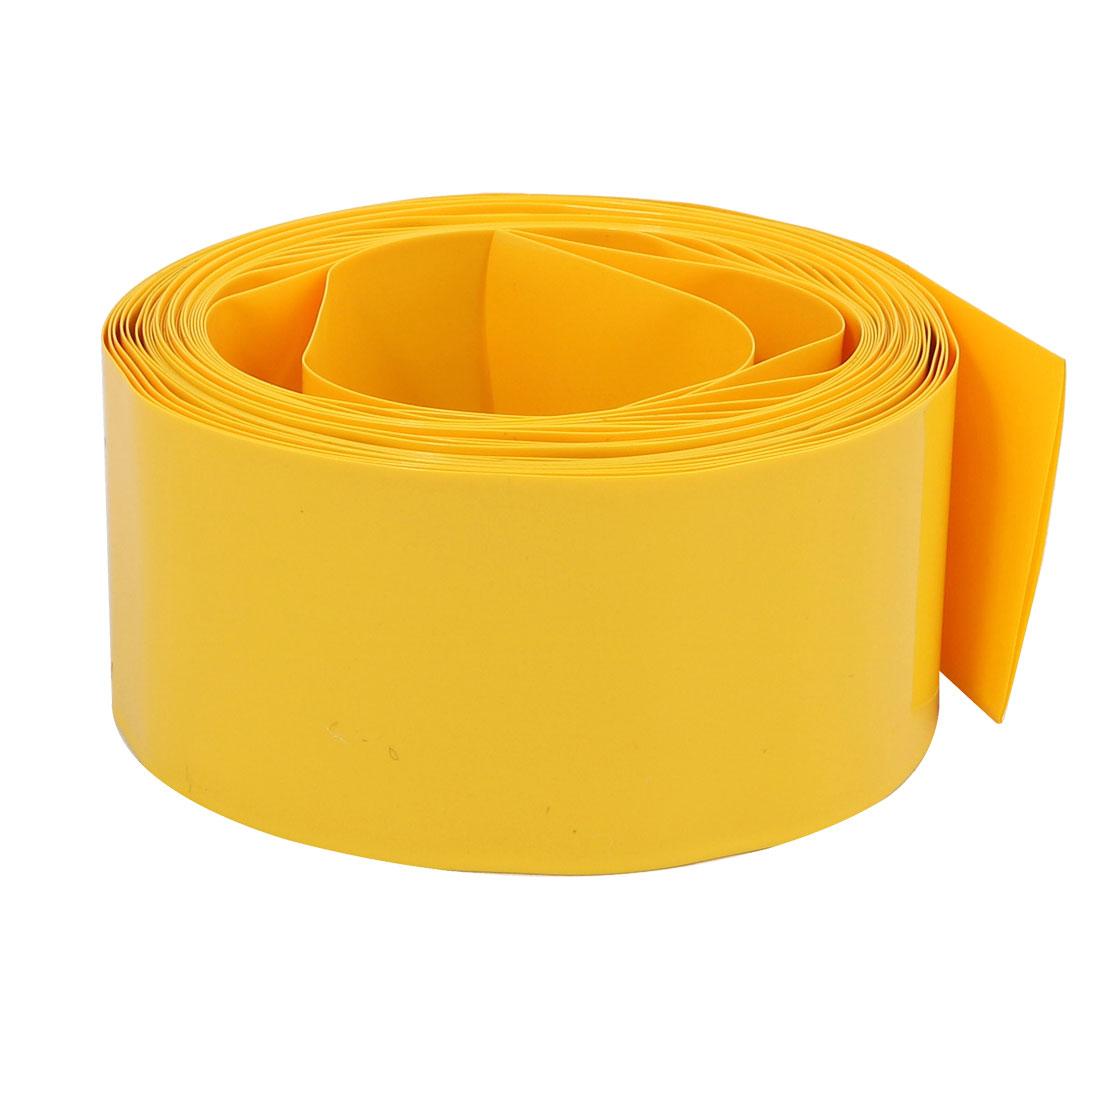 36mm Flat Width 5M Long PVC Heat Shrinkable Tube Yellow for 22650 Battery Pack